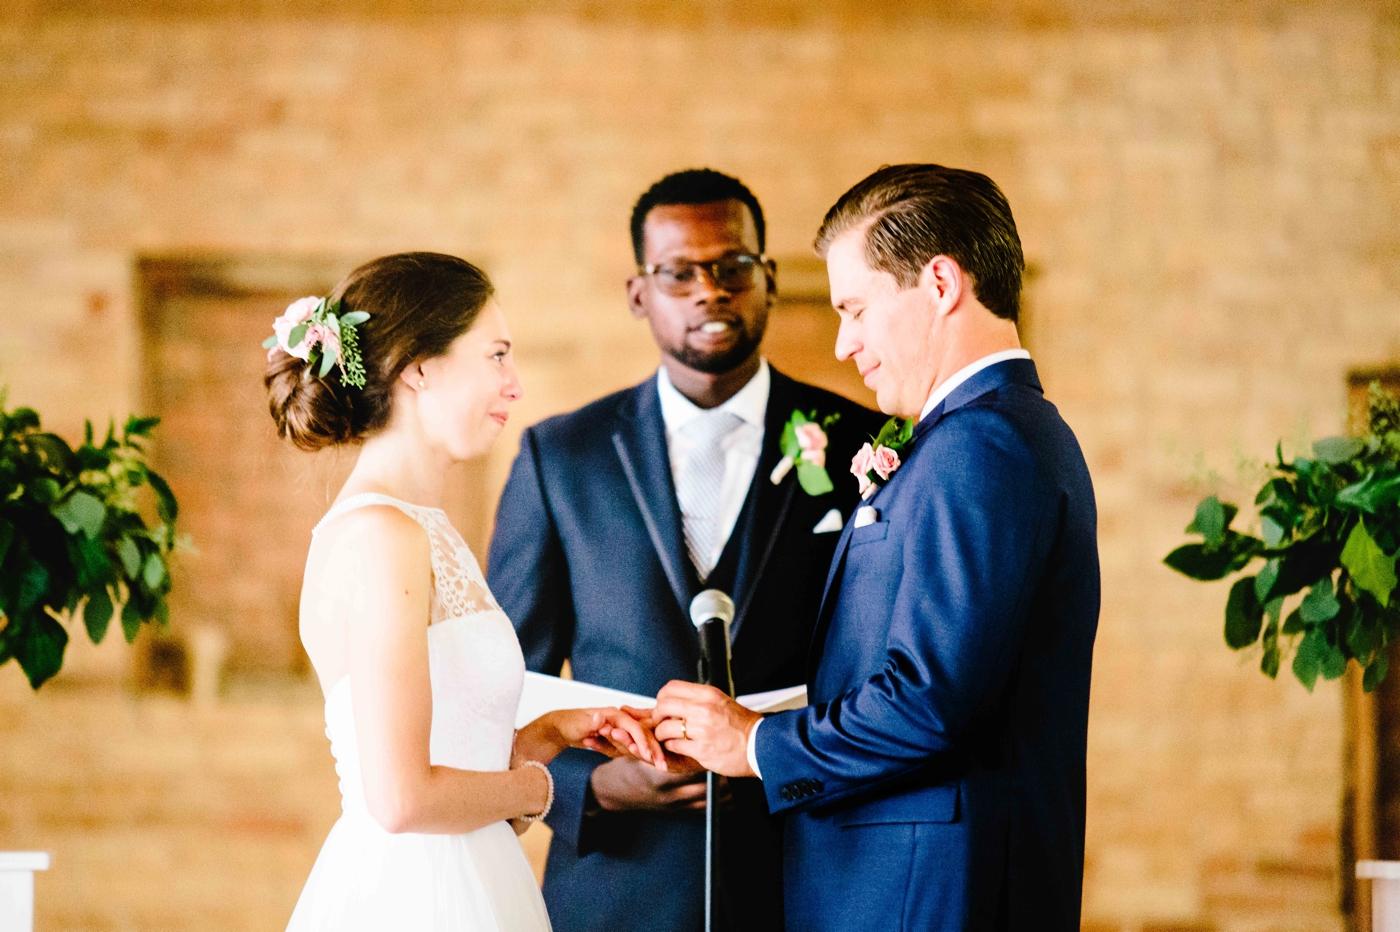 chicago-fine-art-wedding-photography-tyma28